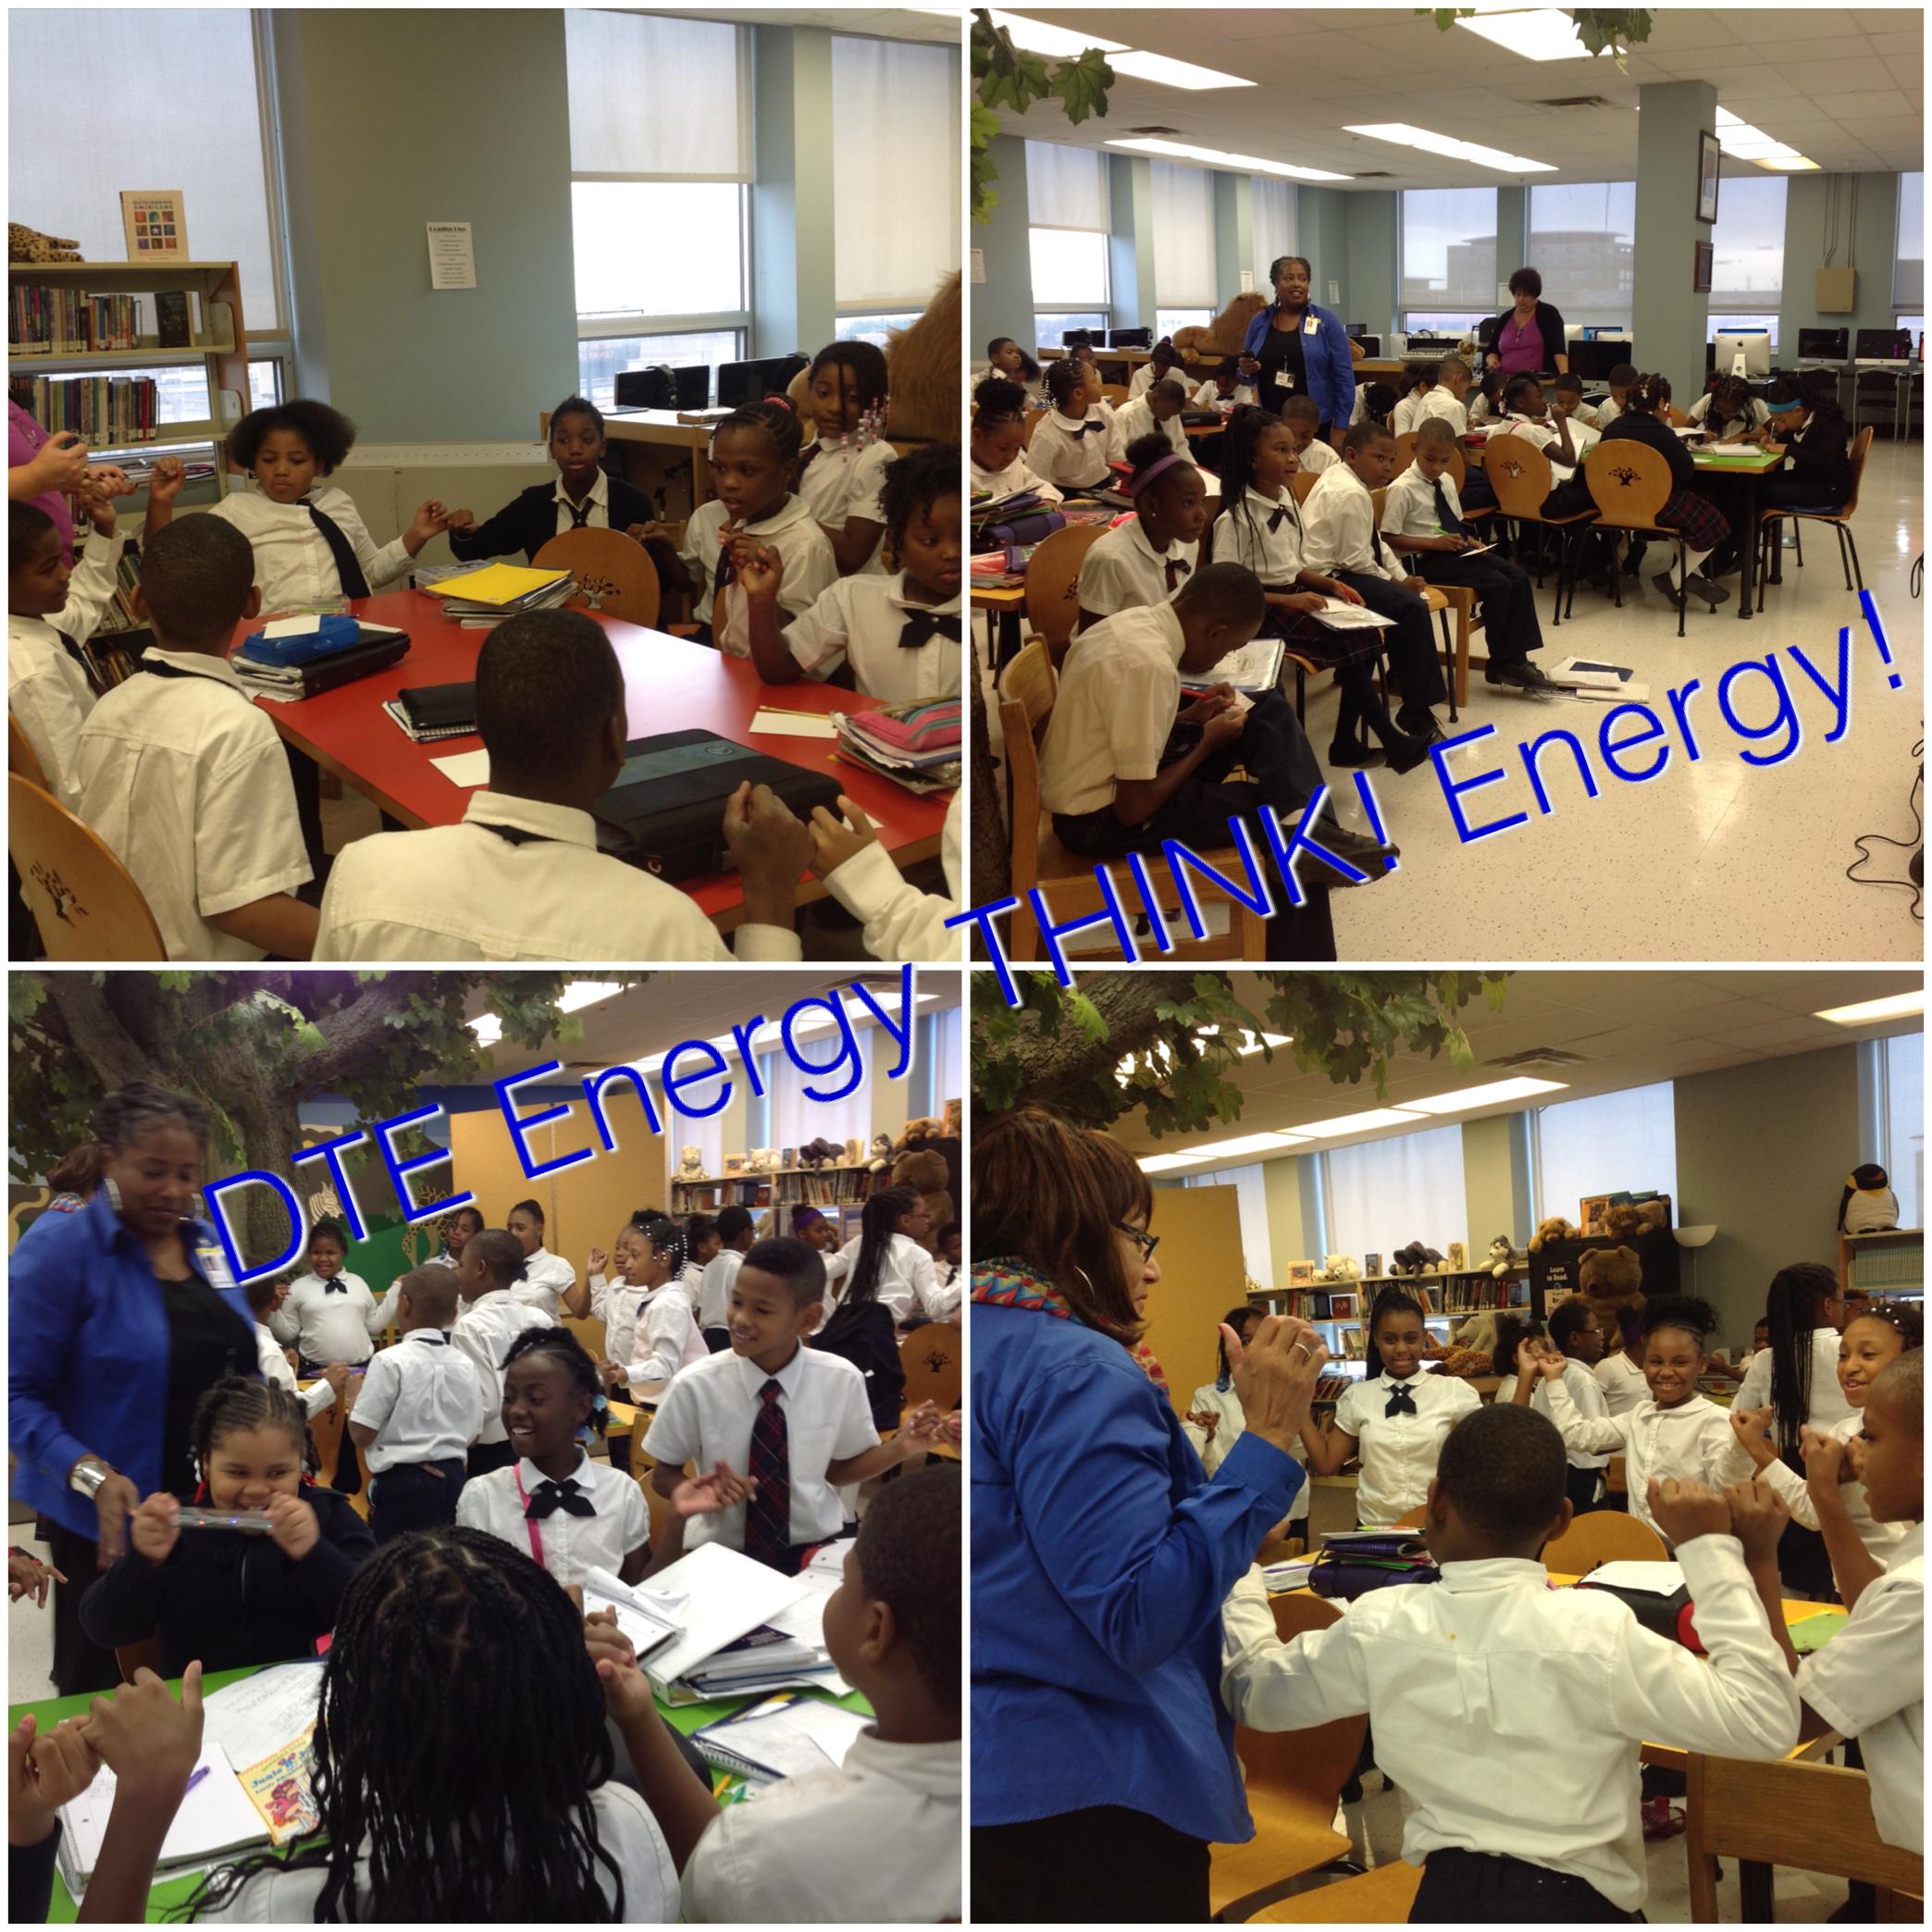 DTE energy 10-15-15